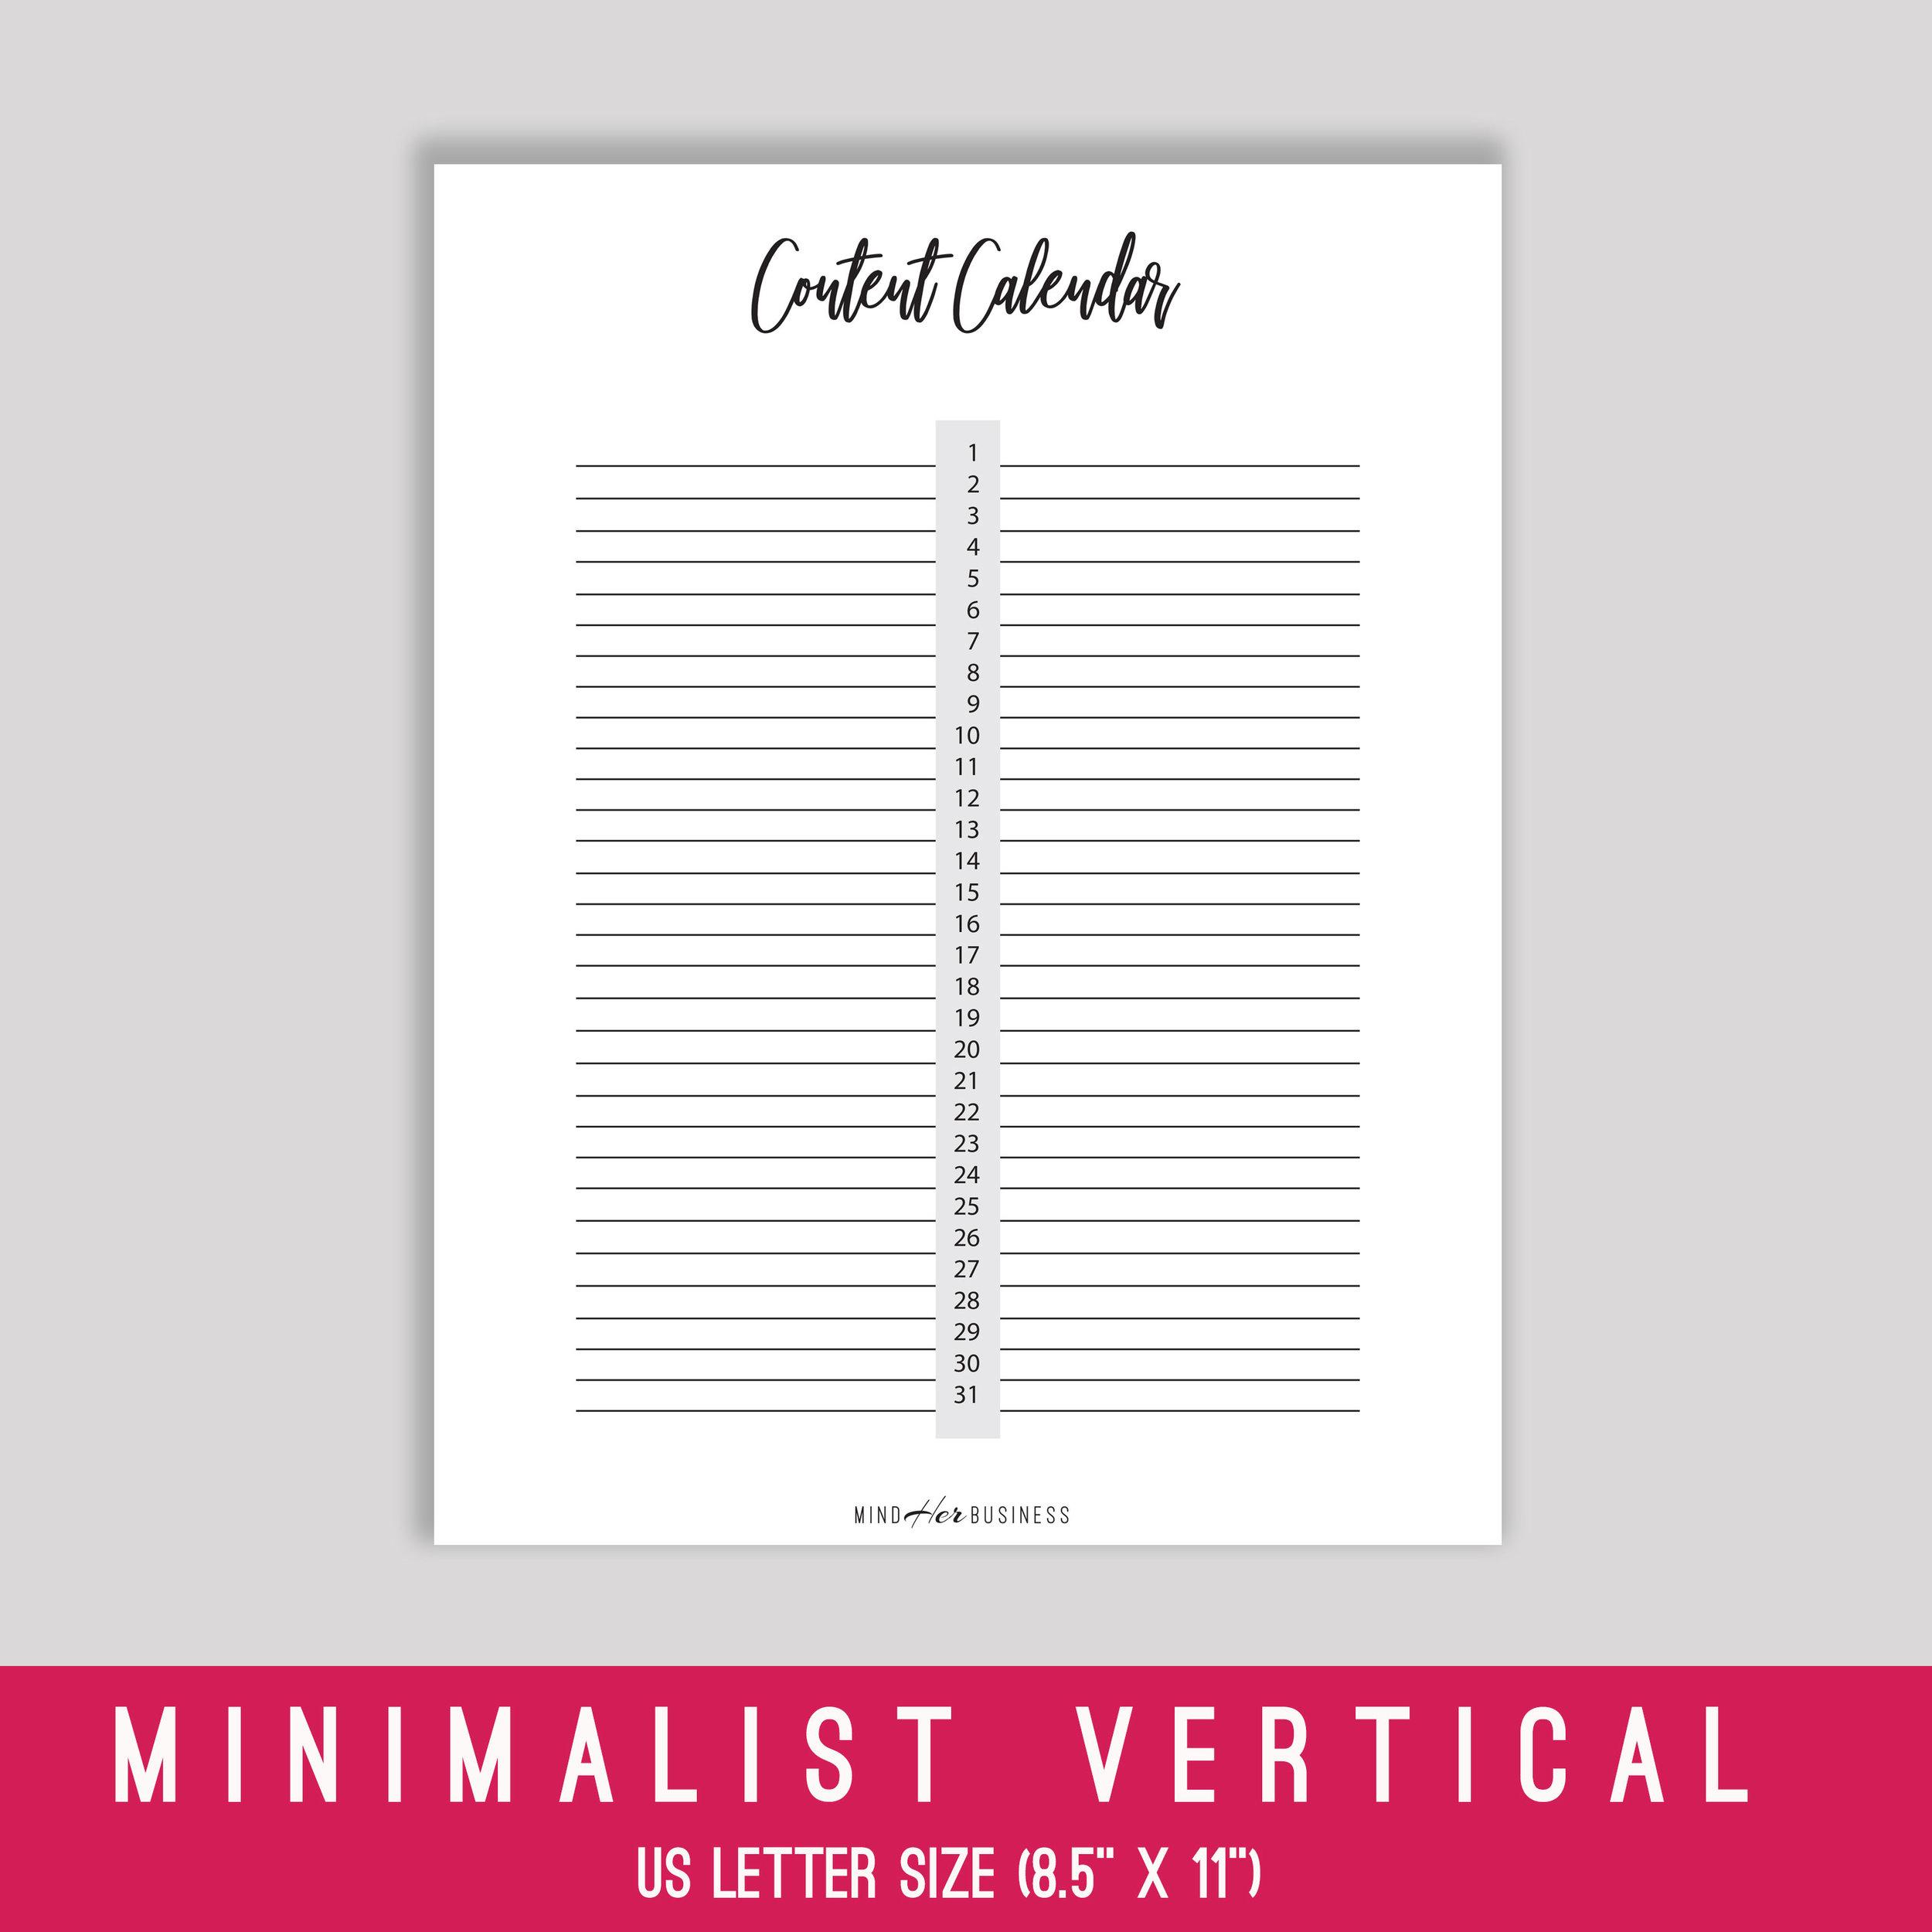 mhb-calendar-mockup-minimalist-letter.jpg